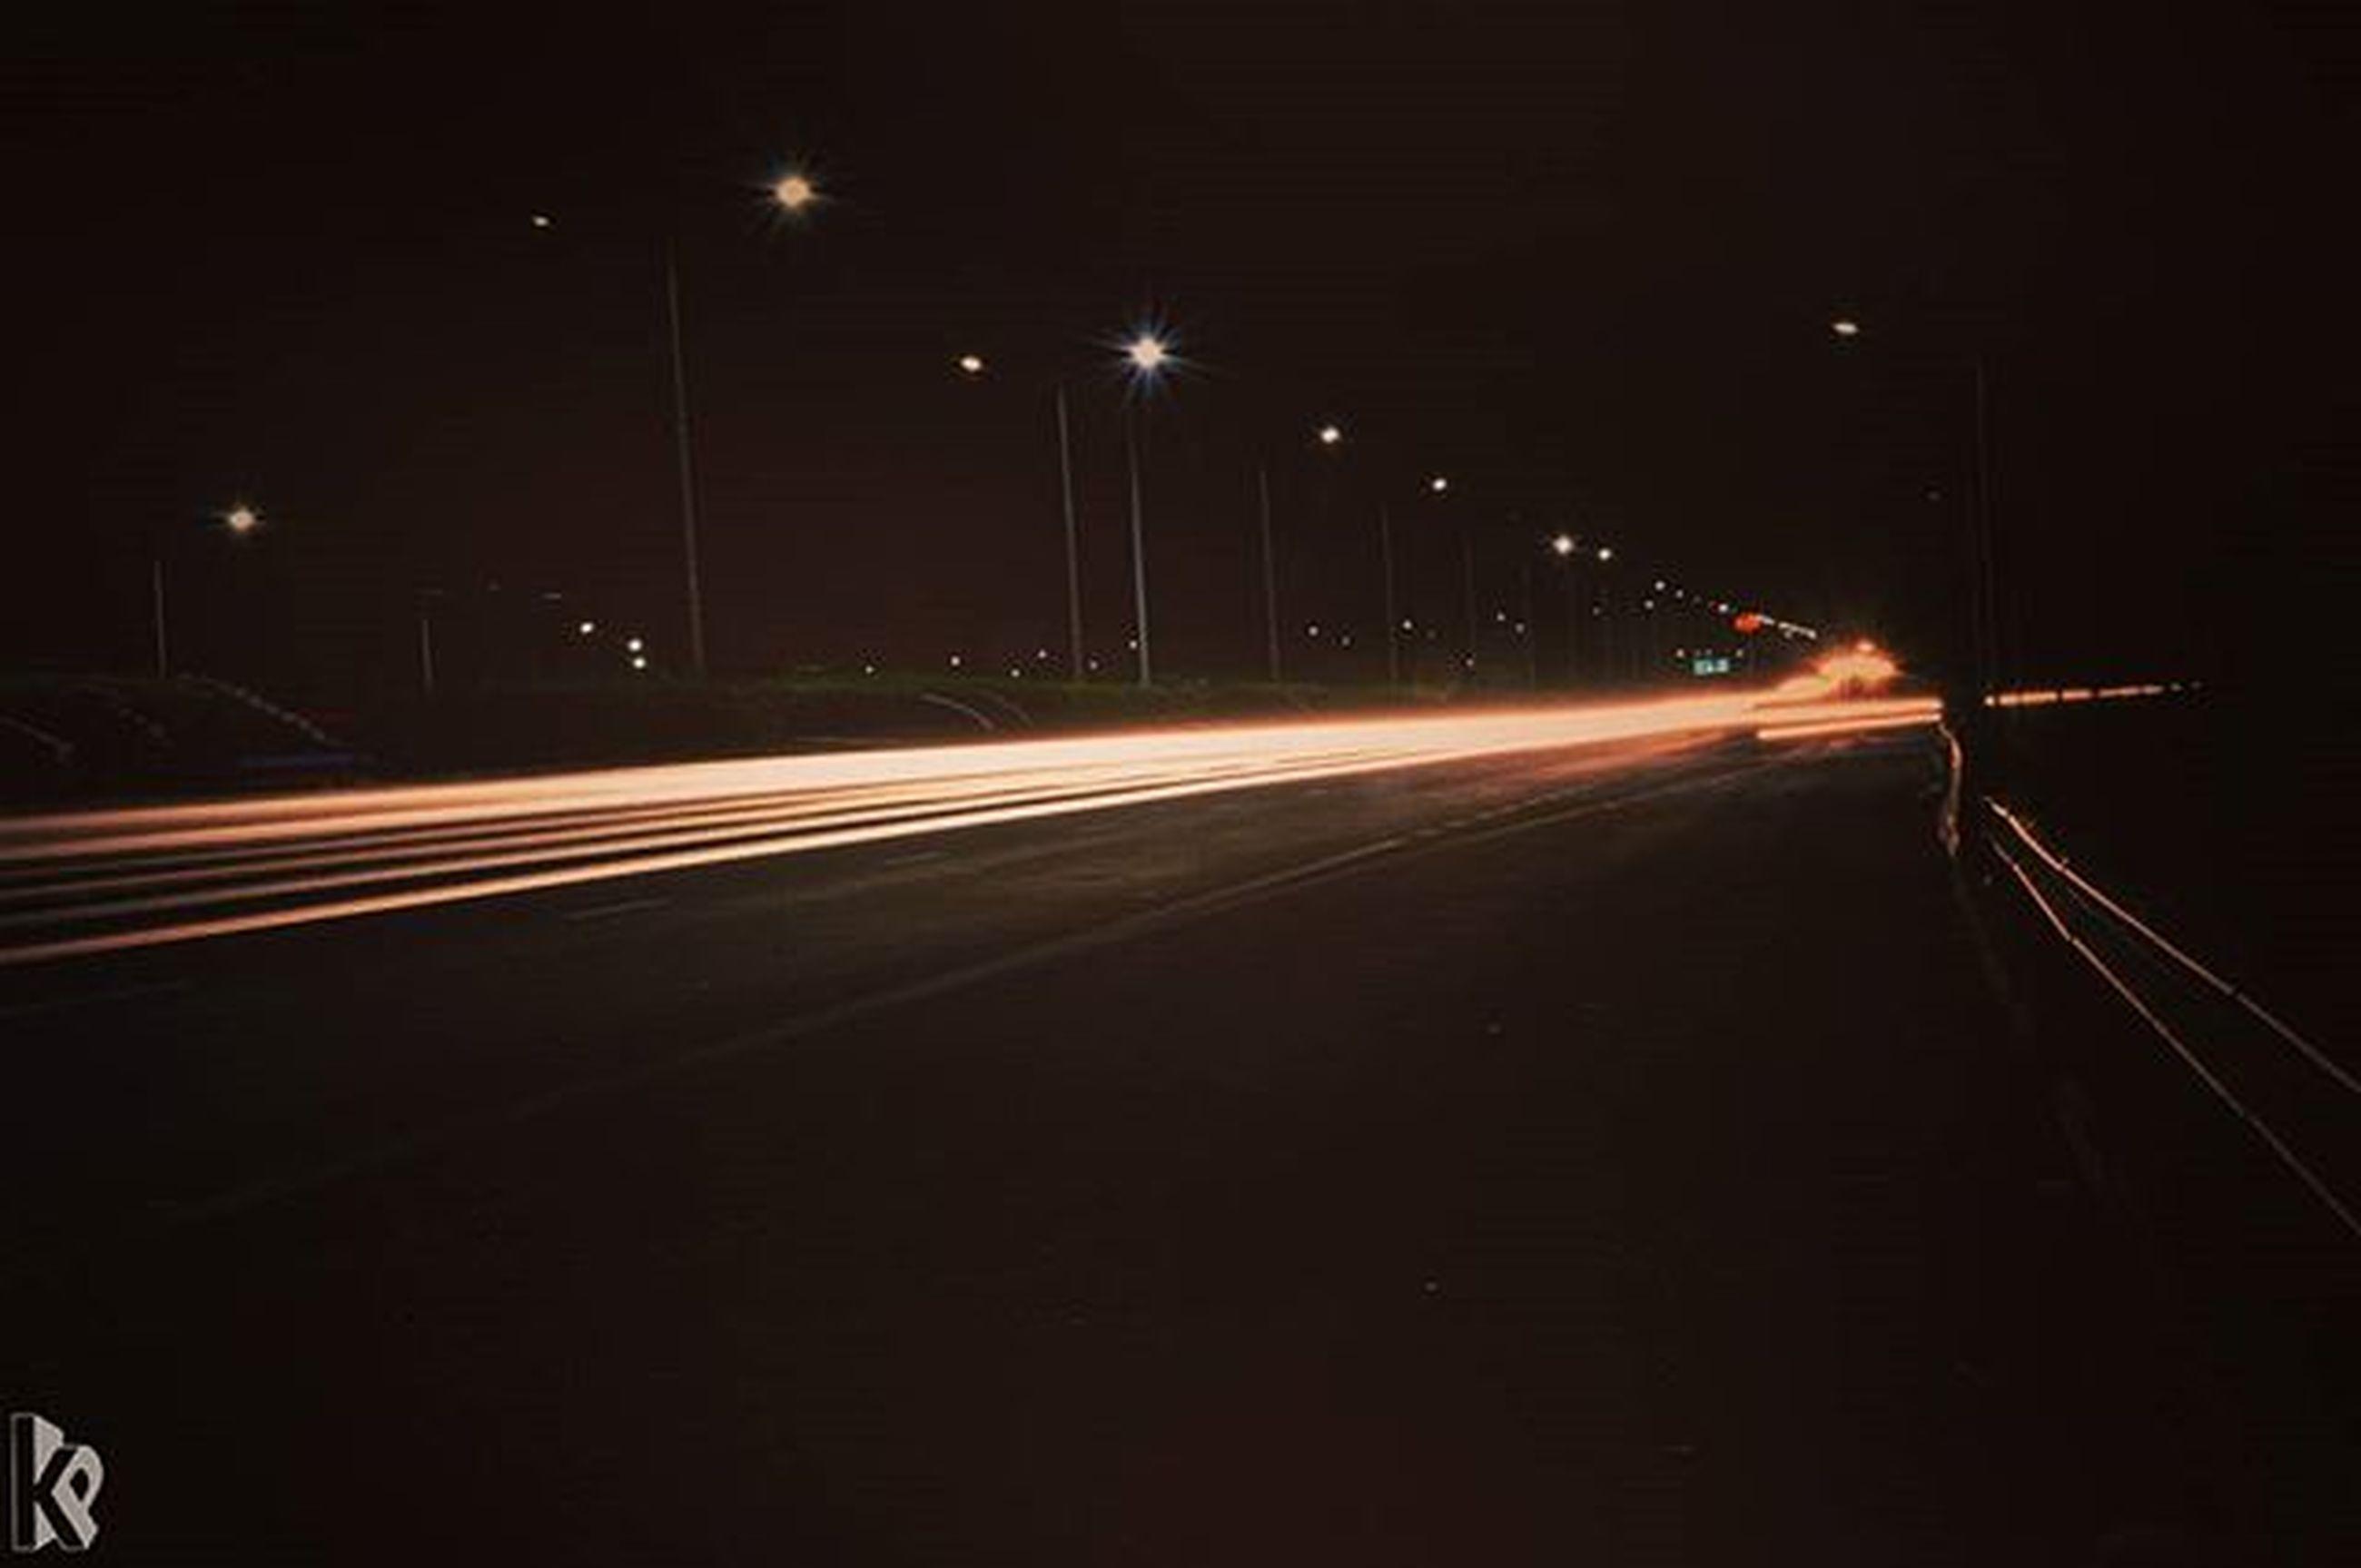 illuminated, night, transportation, long exposure, light trail, speed, motion, blurred motion, road, the way forward, street light, on the move, road marking, diminishing perspective, traffic, highway, street, mode of transport, vanishing point, lighting equipment